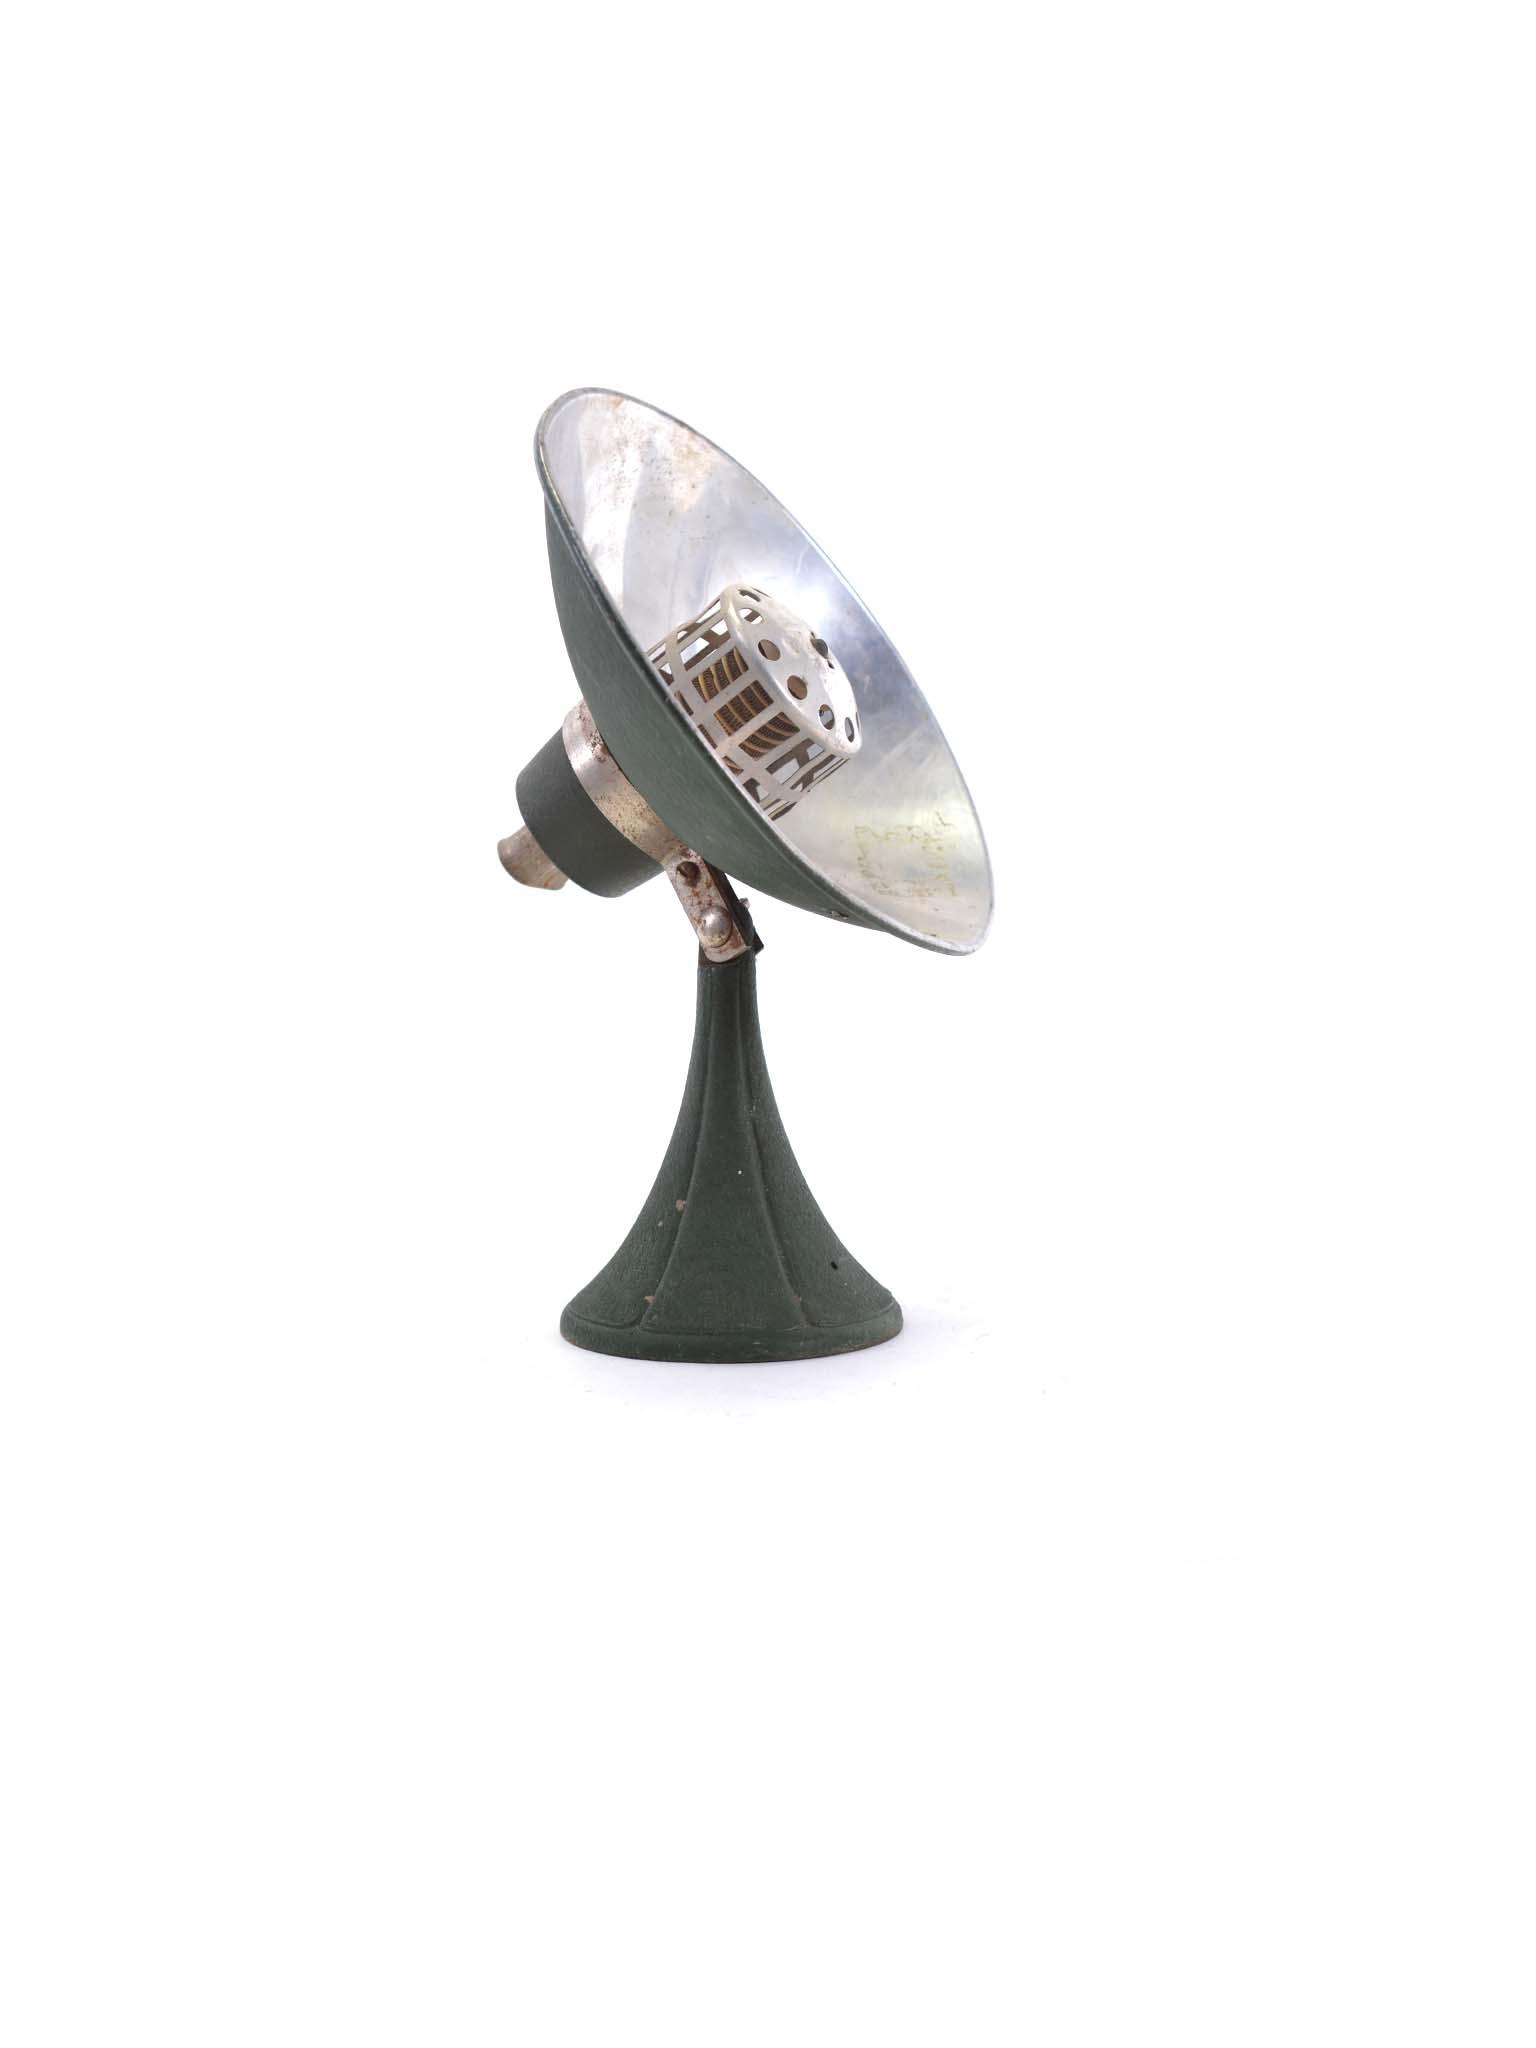 RUSTIC HEAT LAMP